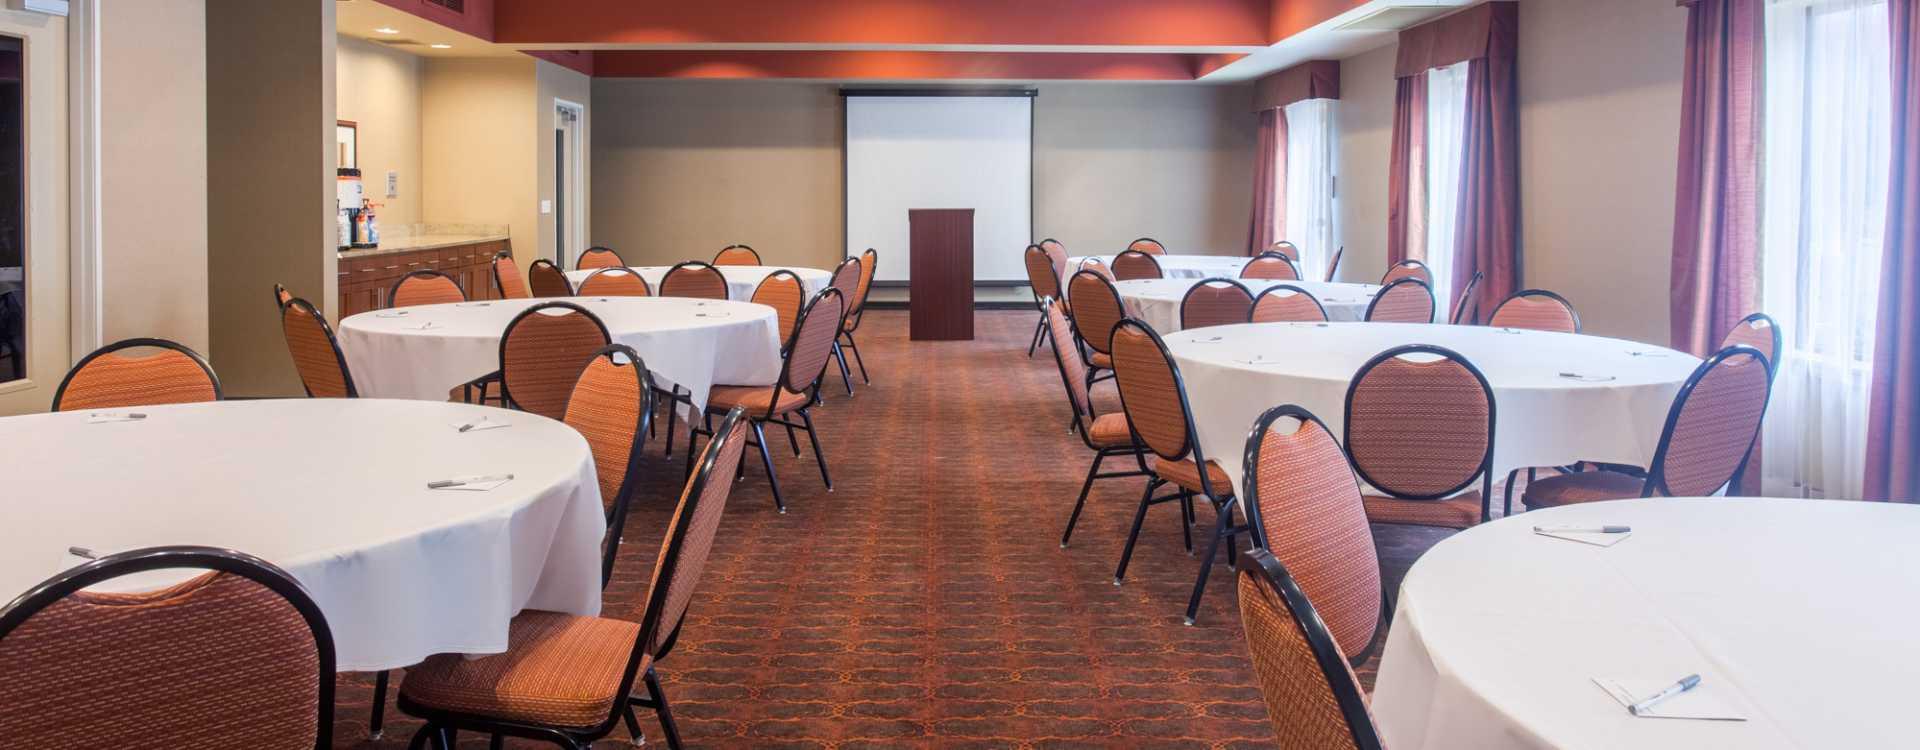 Hampton Inn Seattle Airport Meeting Room